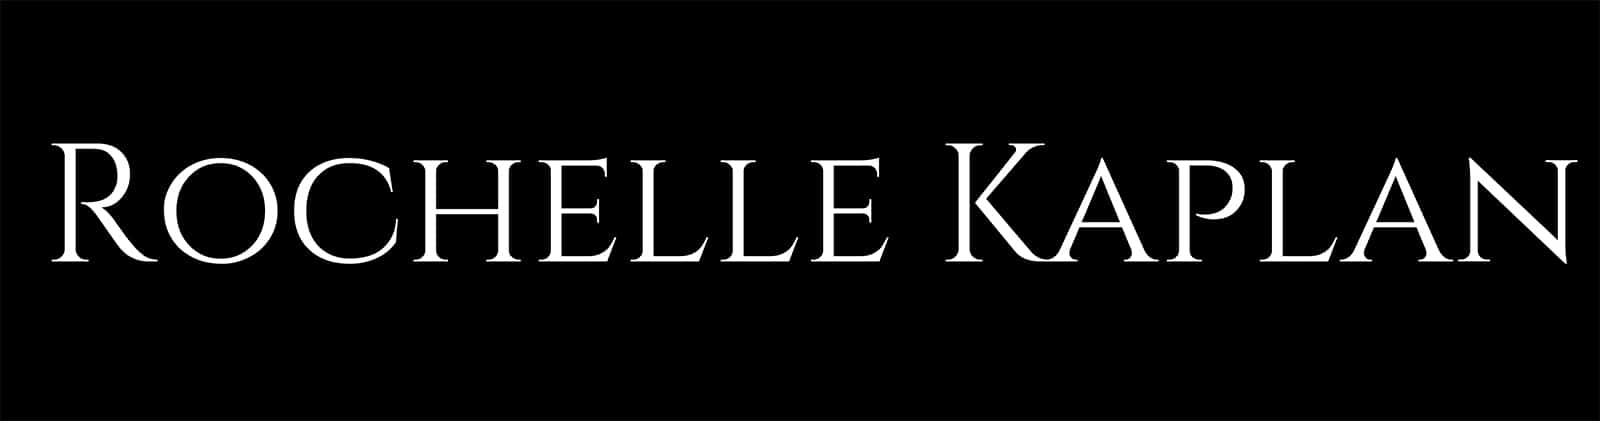 Rochelle Kaplan-Author